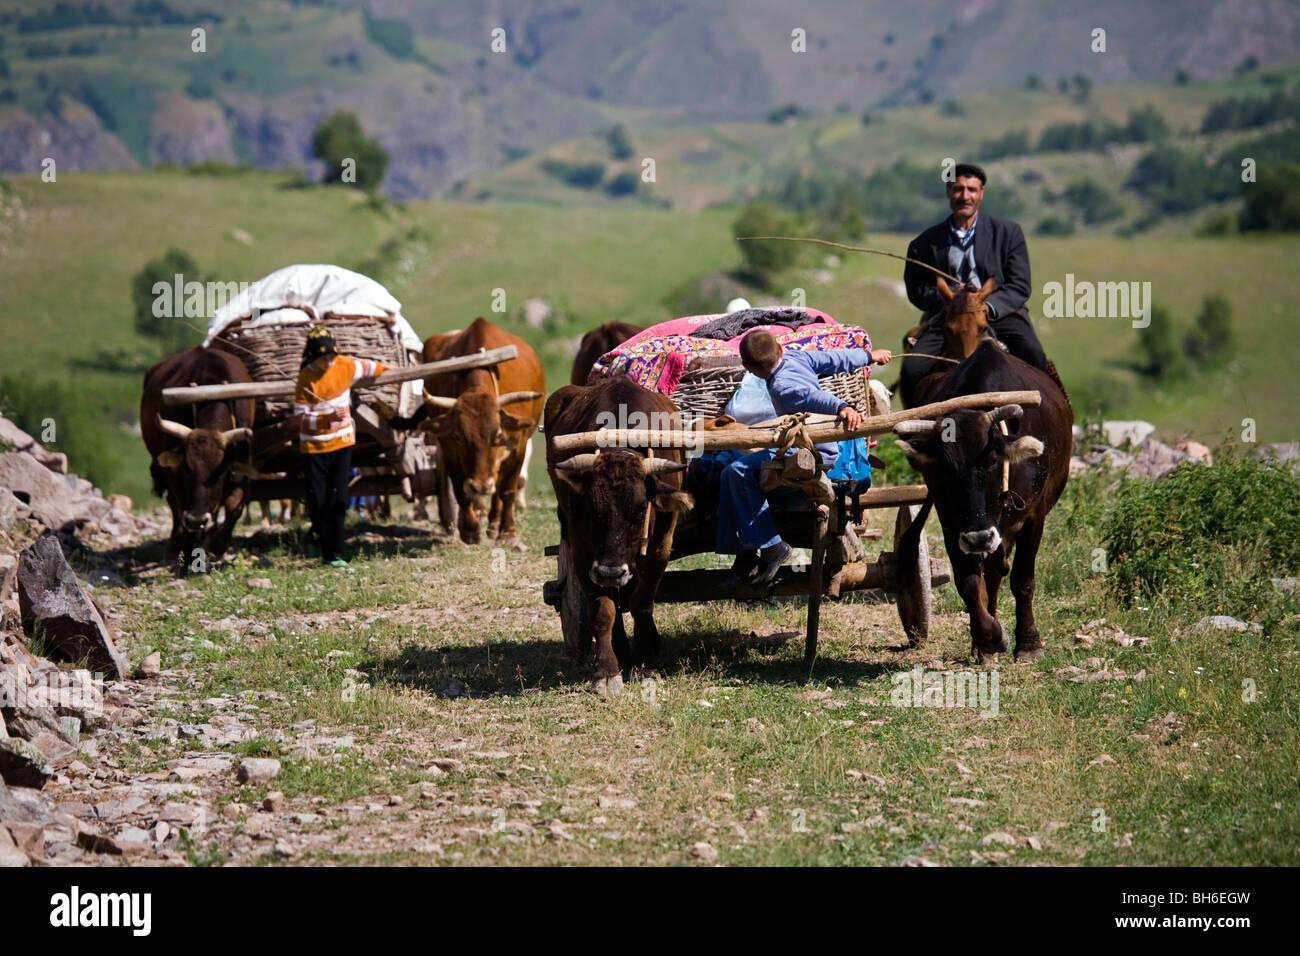 Traveling with ox carts to highlands, Posof Ardahan Turkey. - Stock Image